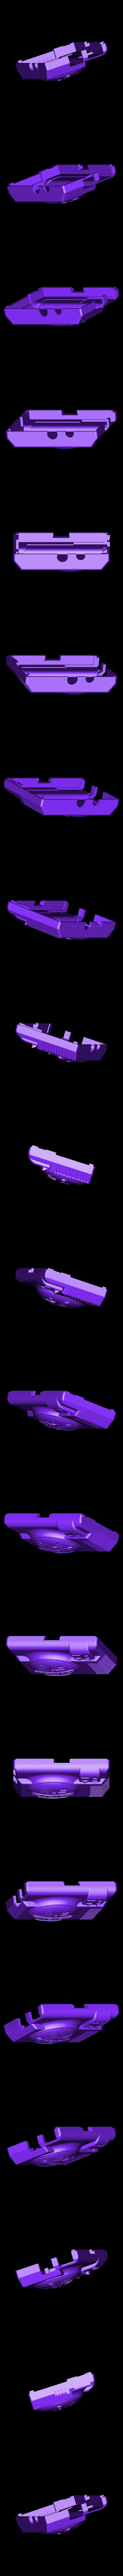 SEGAPI_TOP.stl Download free STL file Sega Pi - Genesis Raspberry Pi-2 Case • 3D printable object, Geoffro